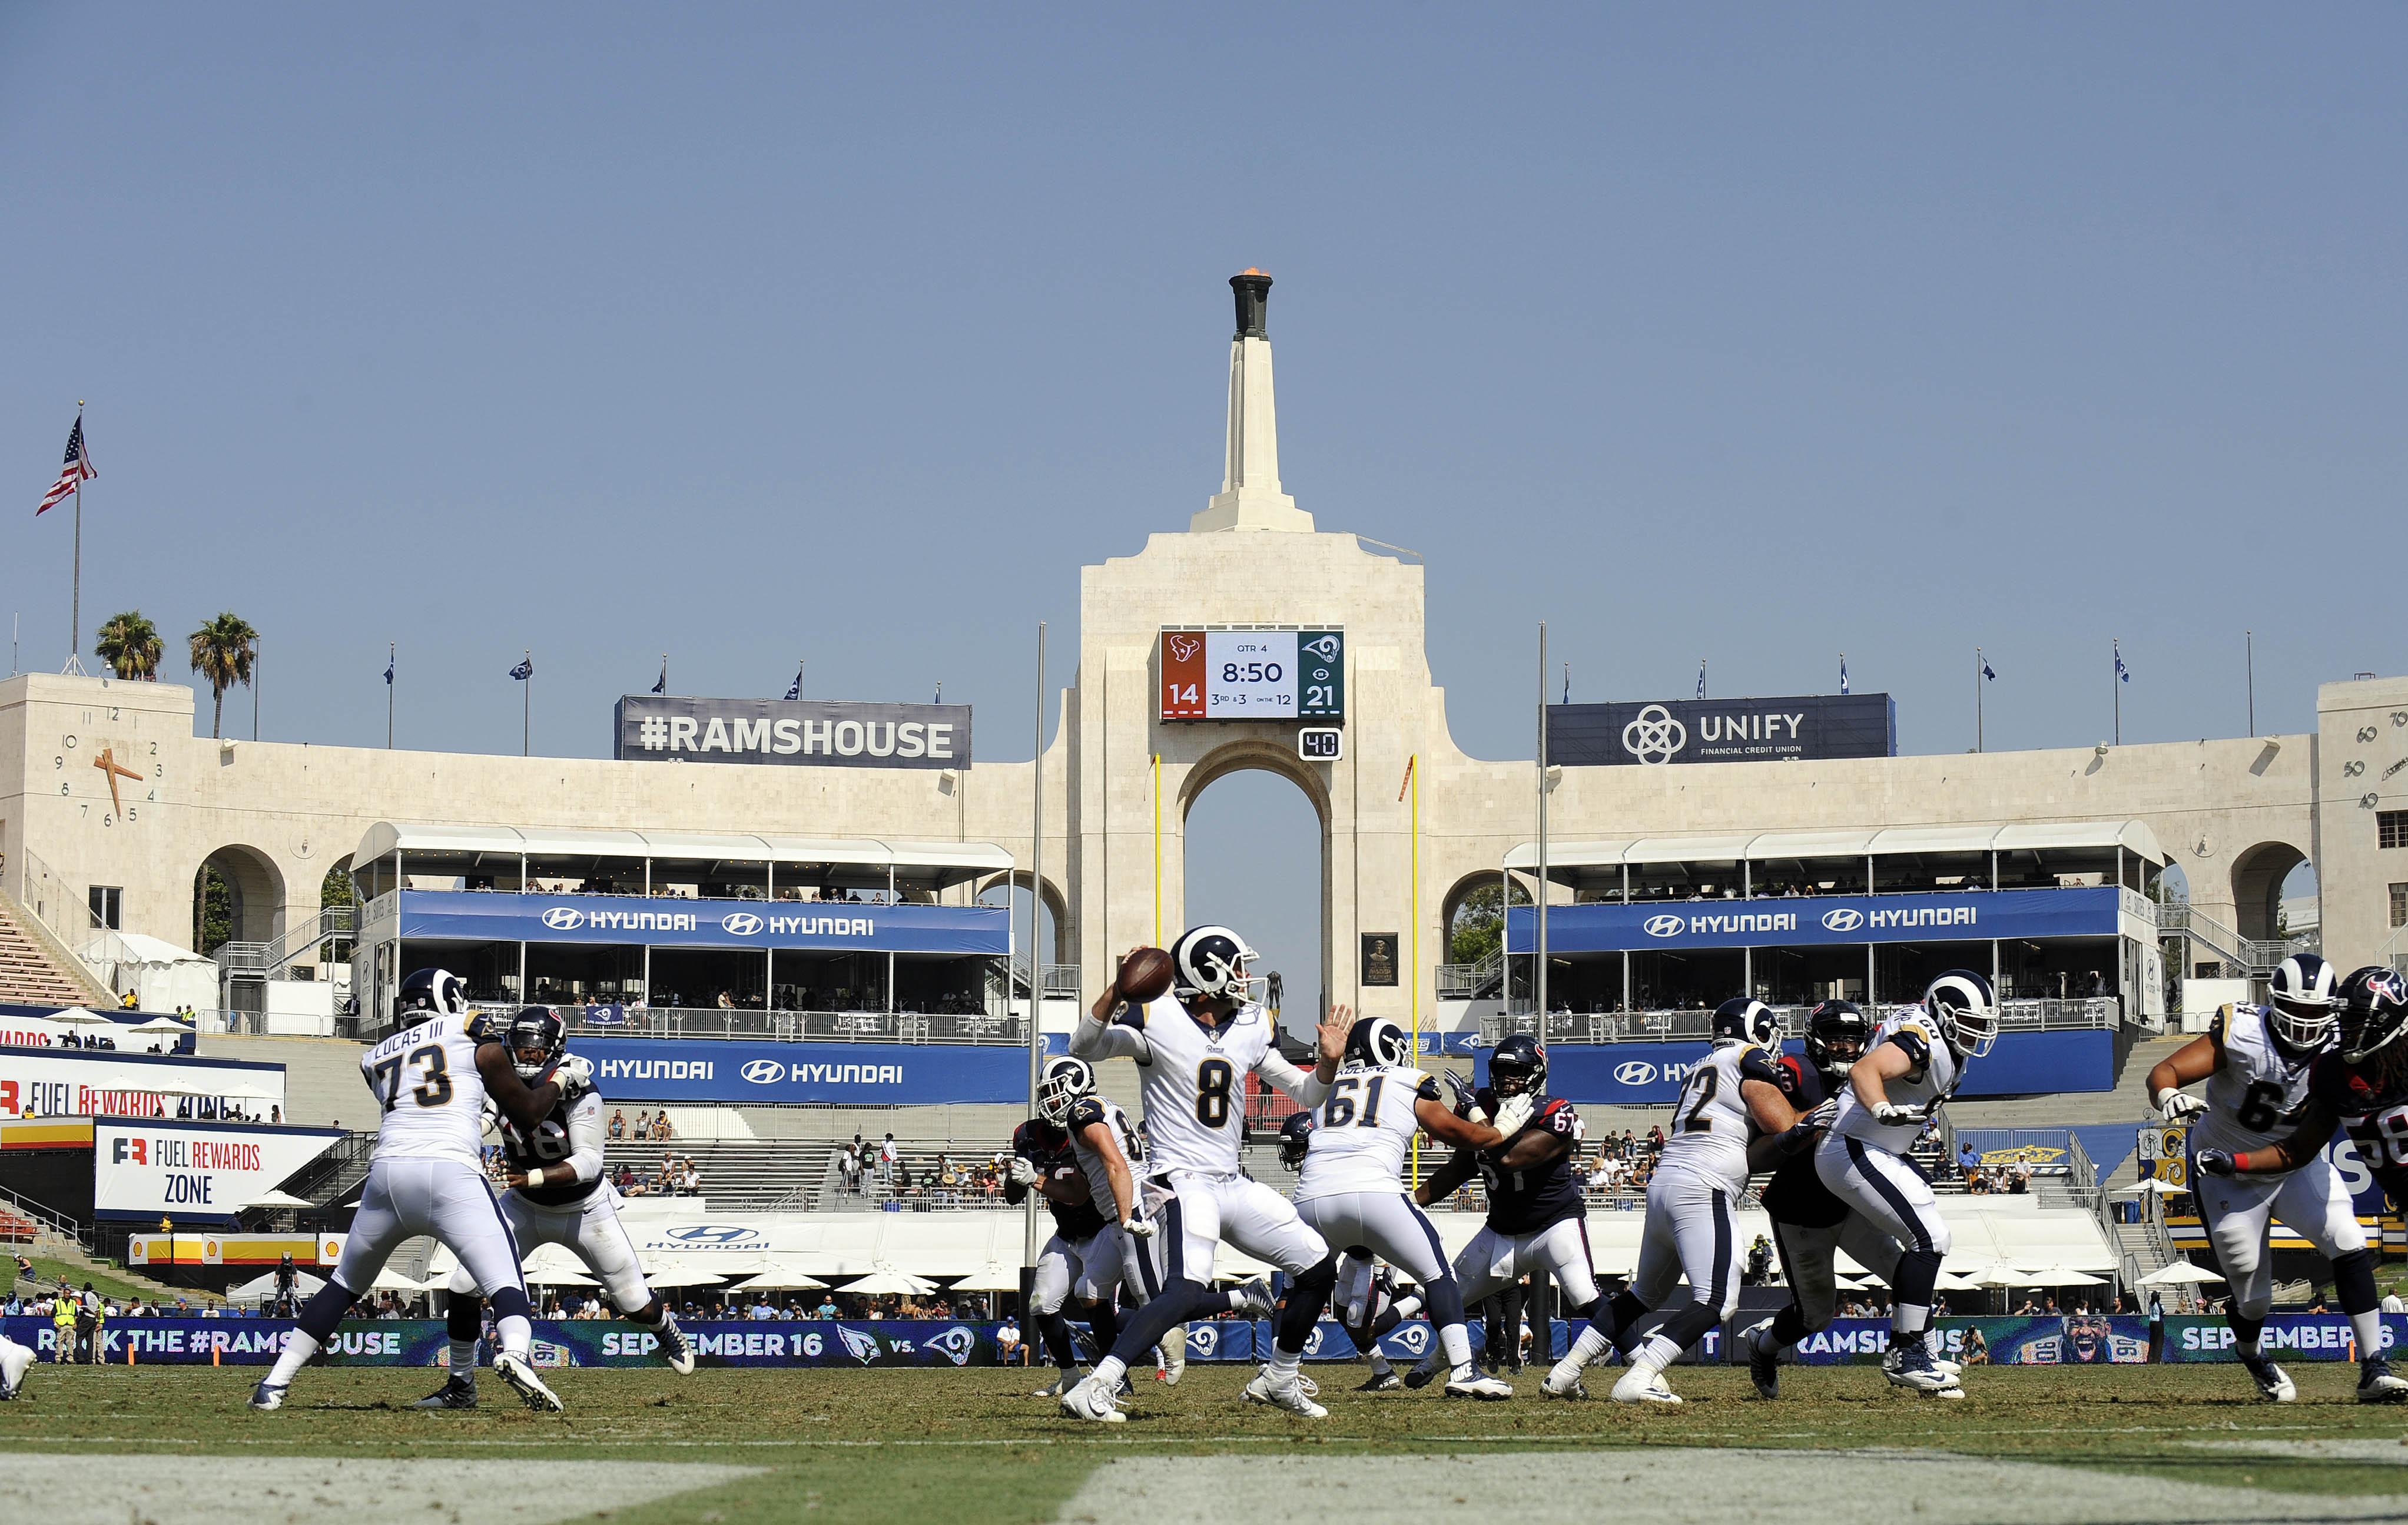 Los Angeles Rams QB Brandon Allen throws against the Houston Texans, August 25, 2018.